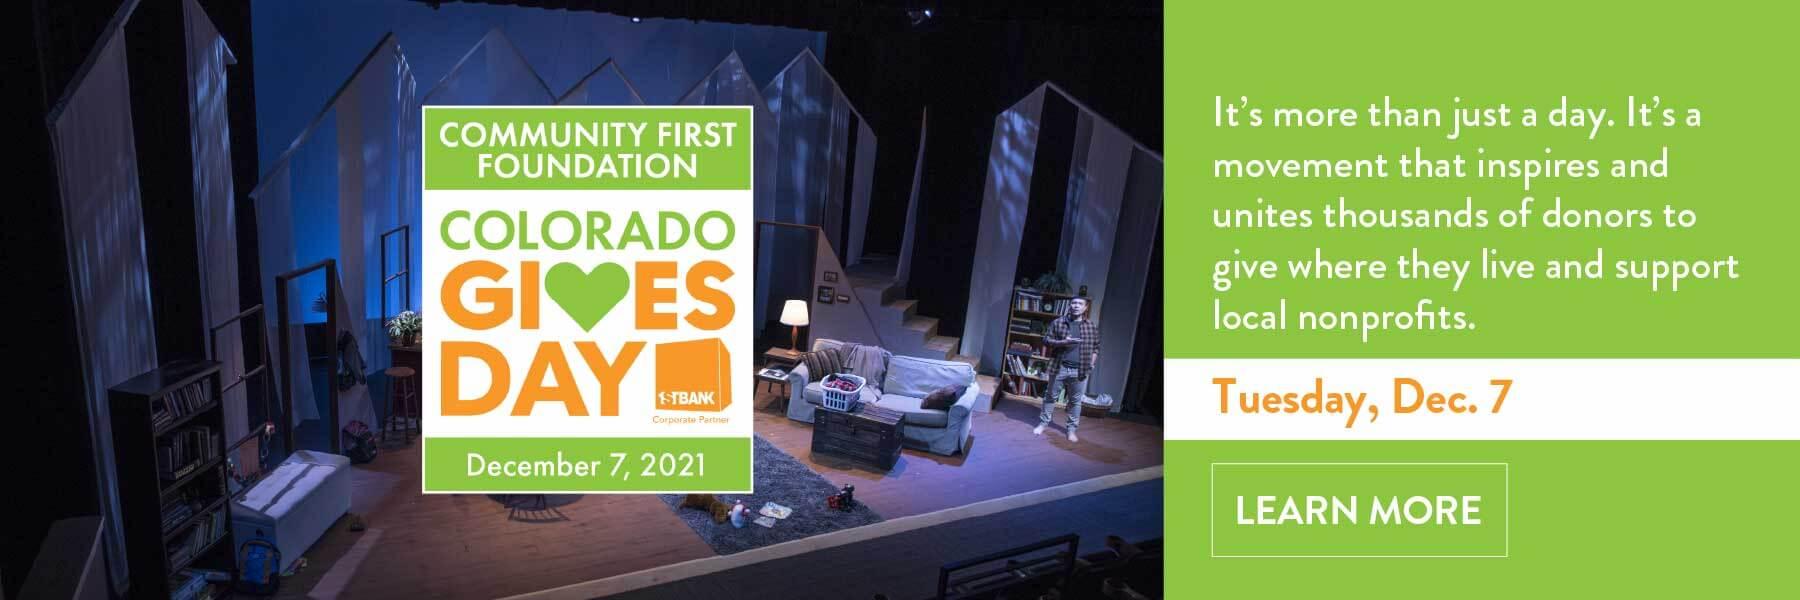 Colorado Gives Day 2021 slider